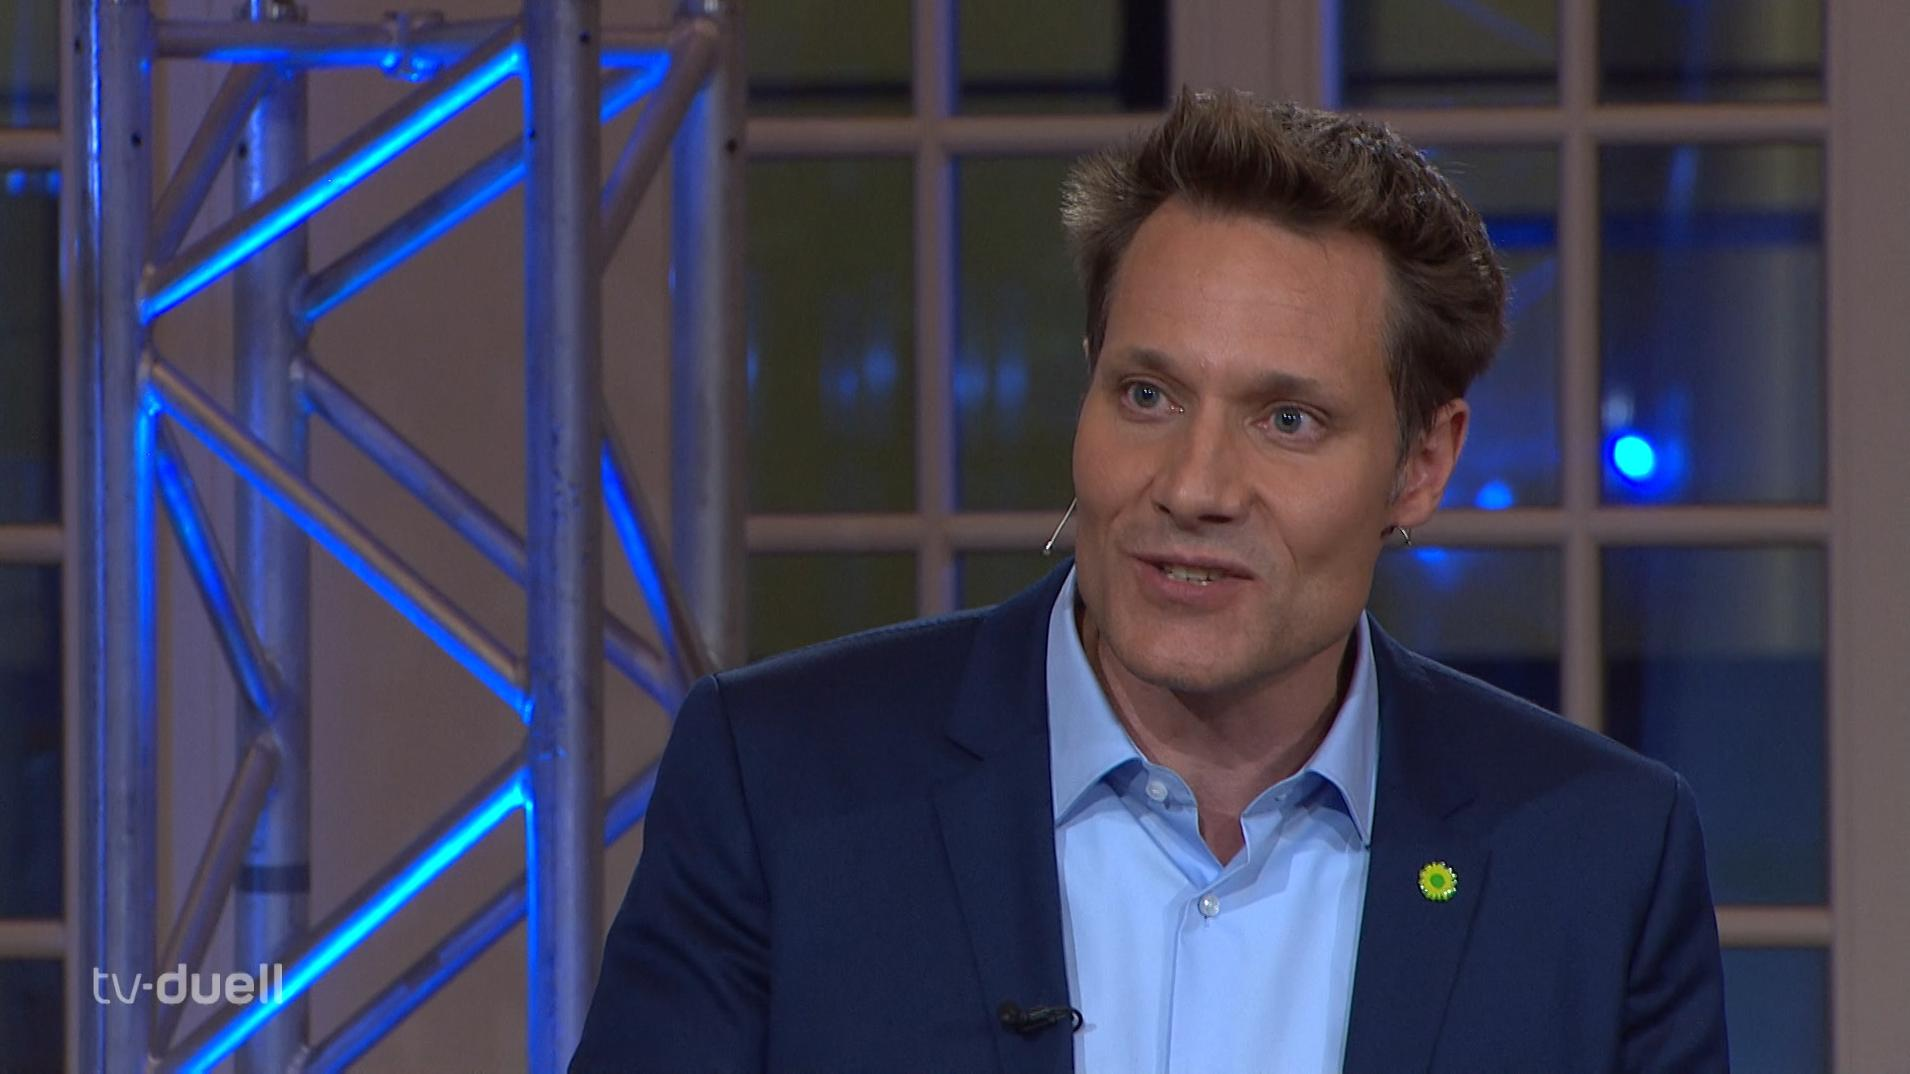 Grünen-Spitzenkandidat Ludwig Hartmann im TV-Duell